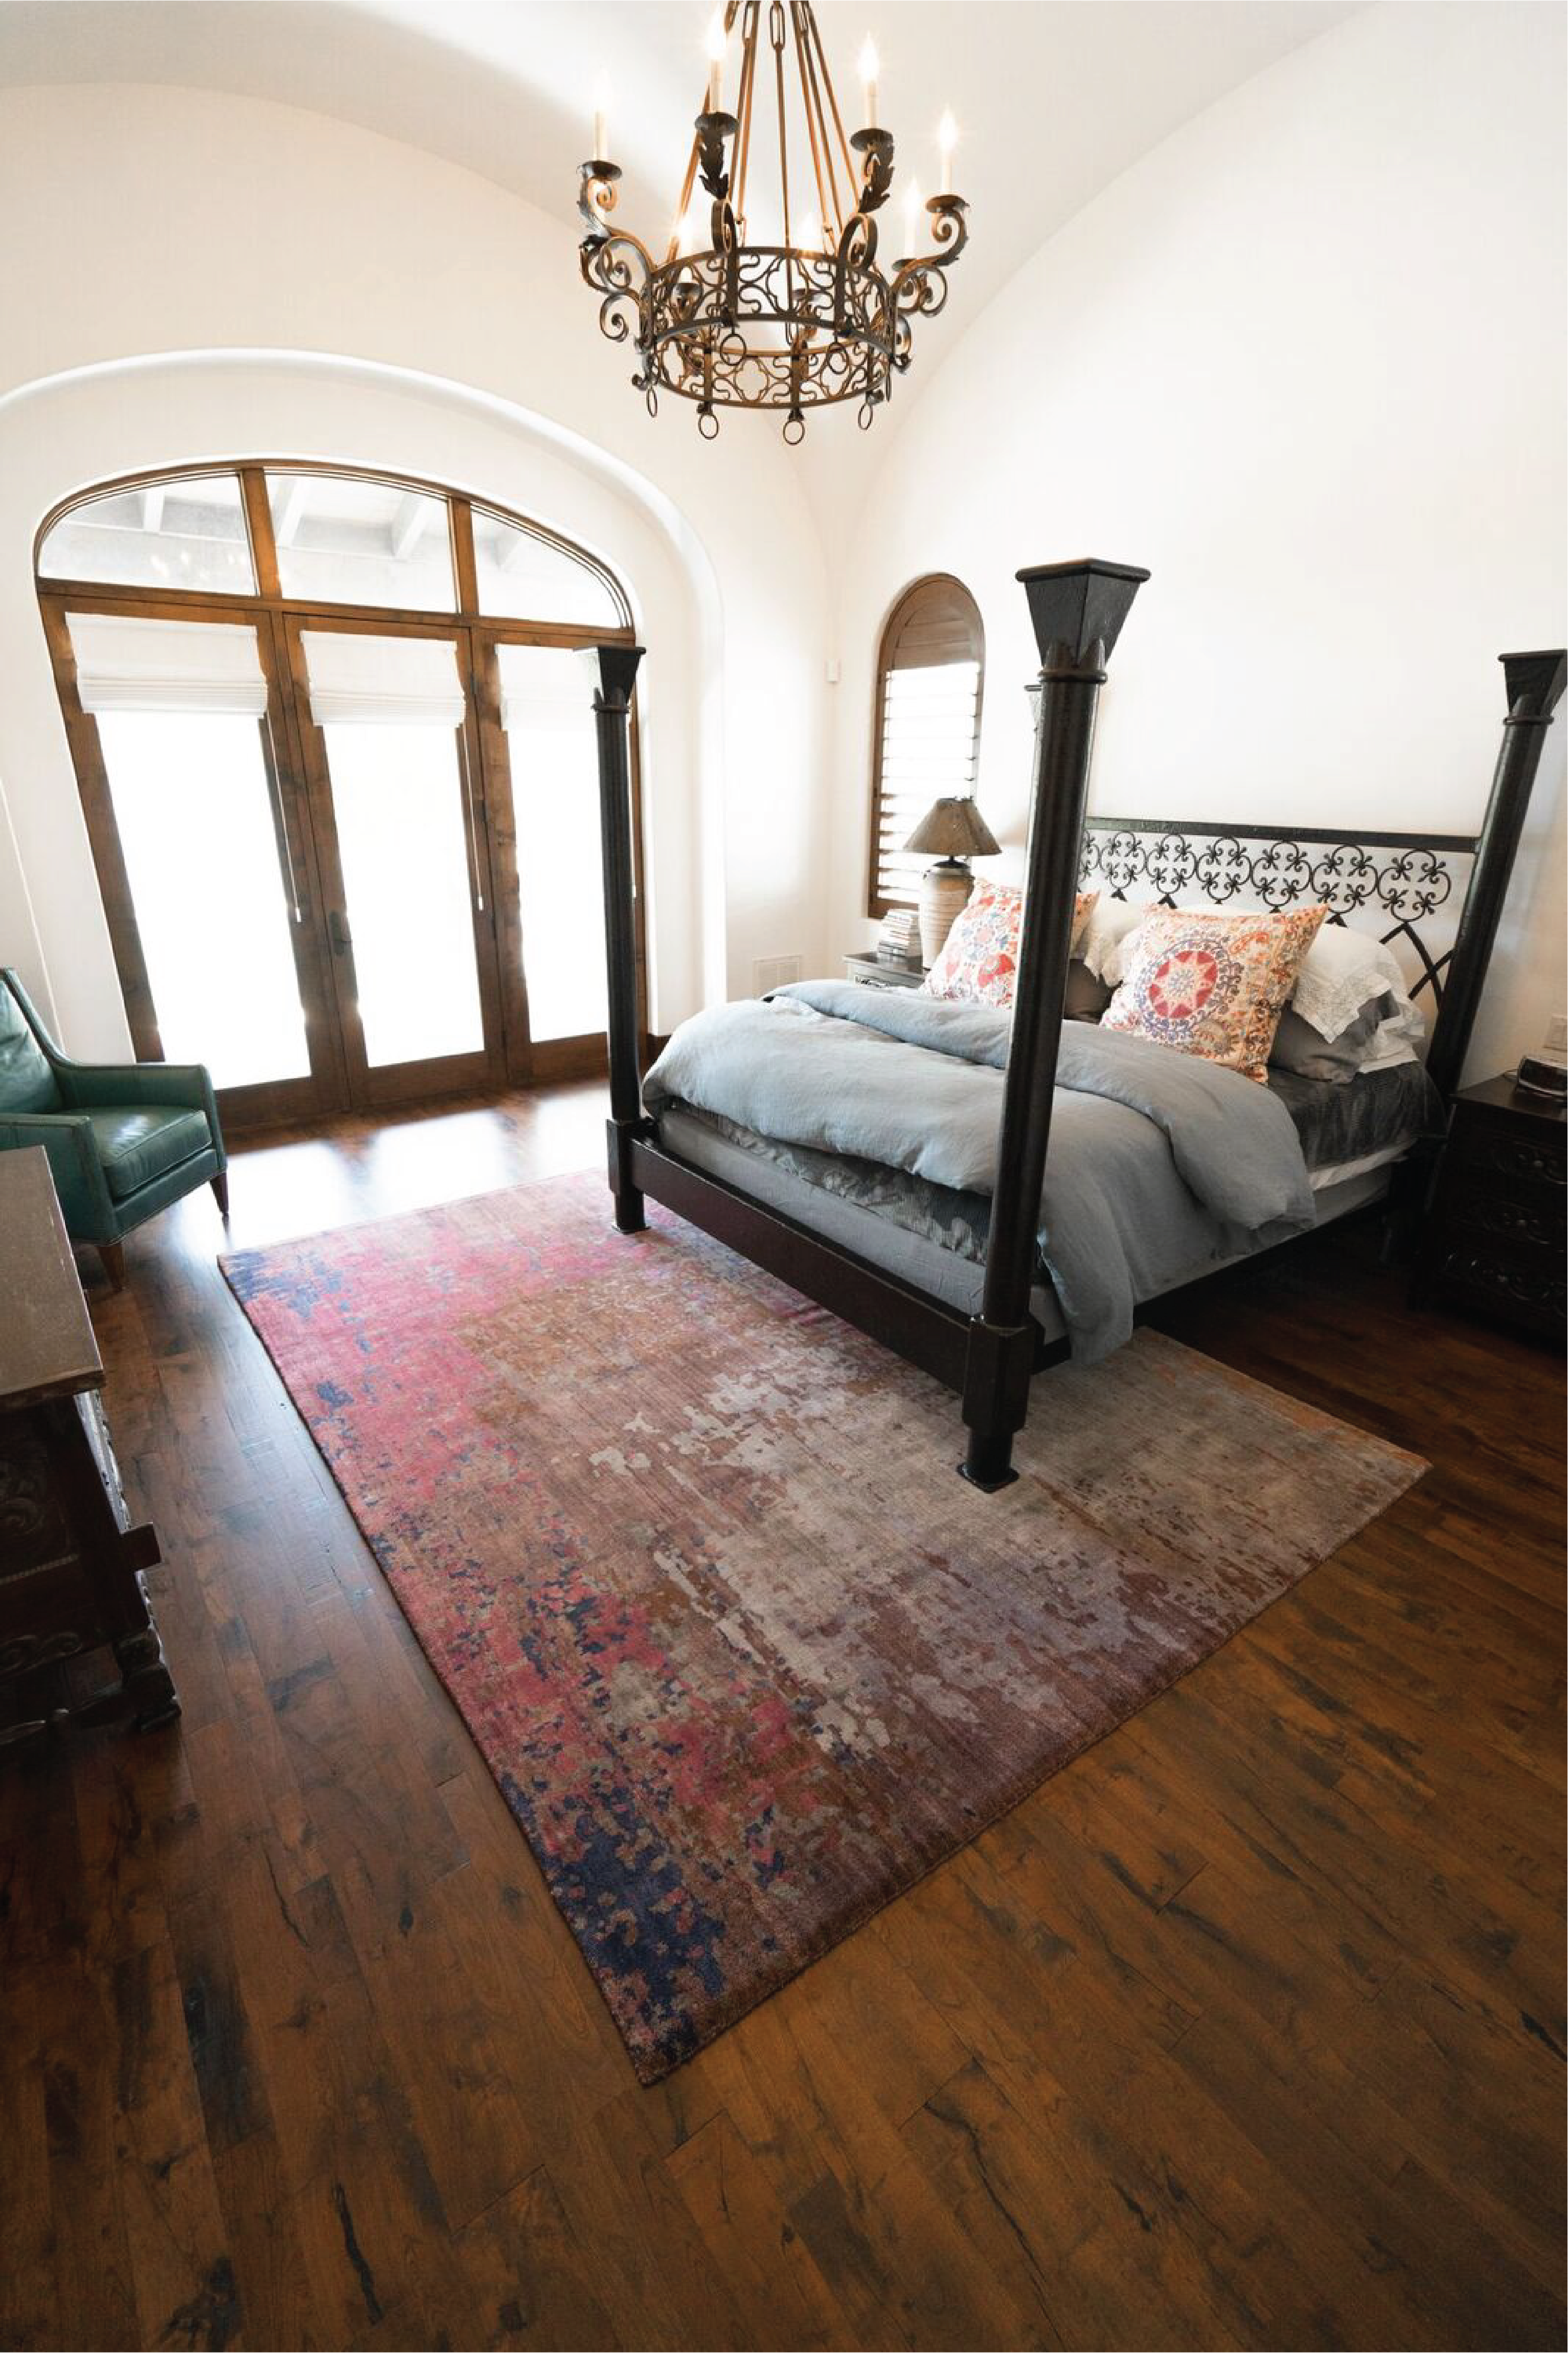 Spanish Style Bedroom Mesquite Hardwood Floors Colorful Area Rug Spanish Style Bedroom Spanish Style Hardwood Design